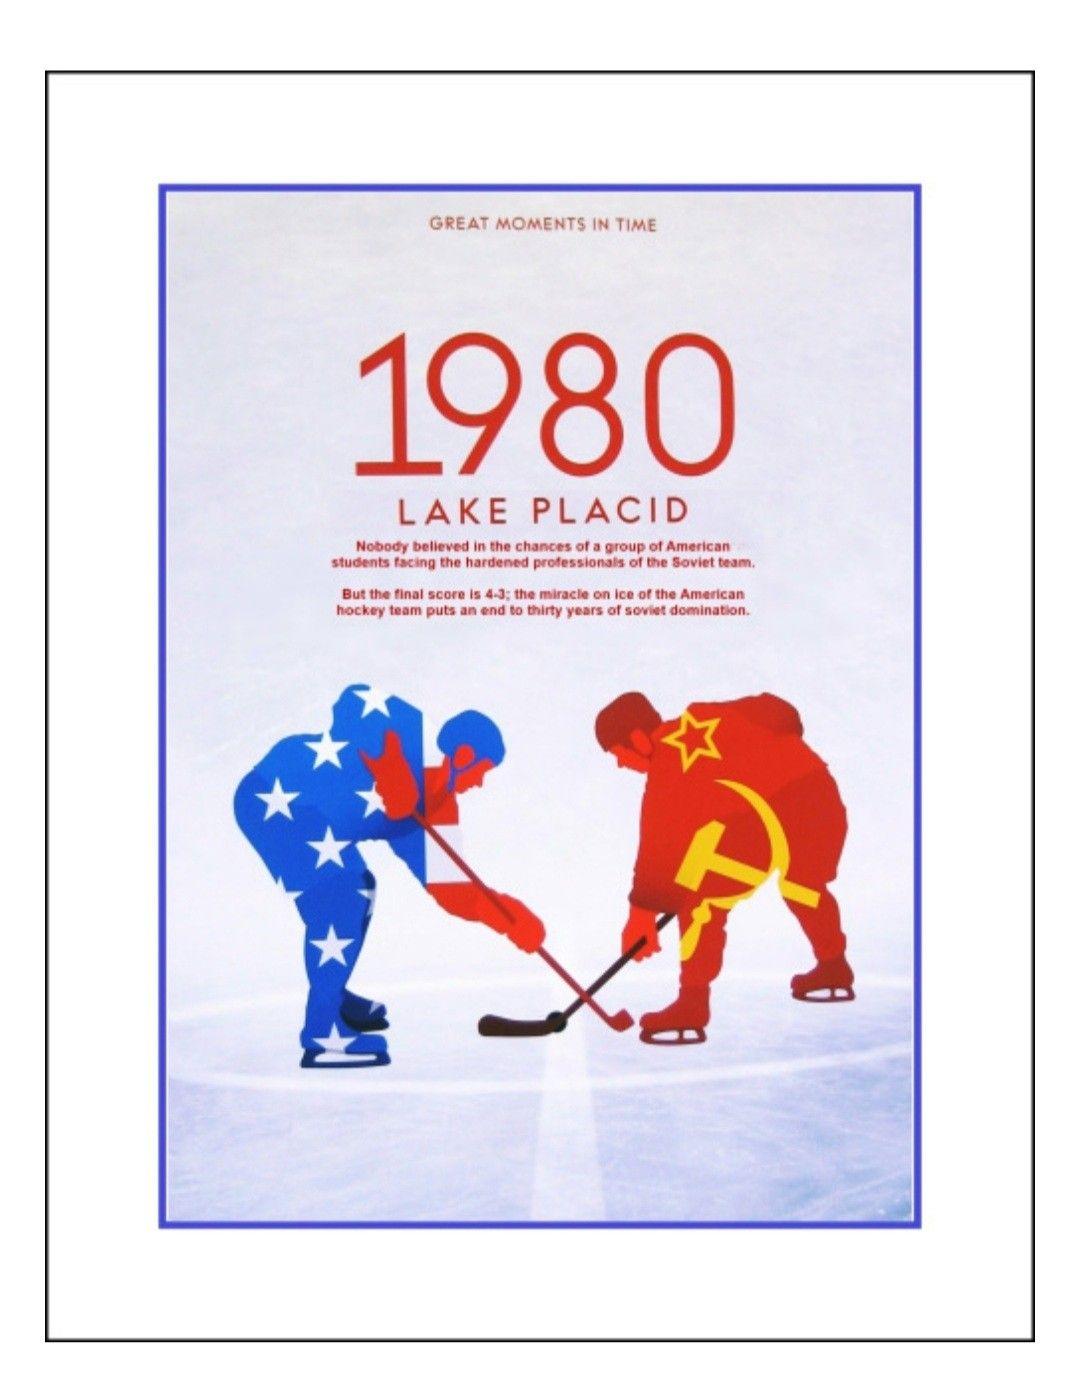 Vintage 1980 Olympics Hockey Memorabilia Poster Miracle On Ice Wall Art Gift Arleyart Com In 2021 Hockey Wall Art Olympic Hockey Hockey Posters